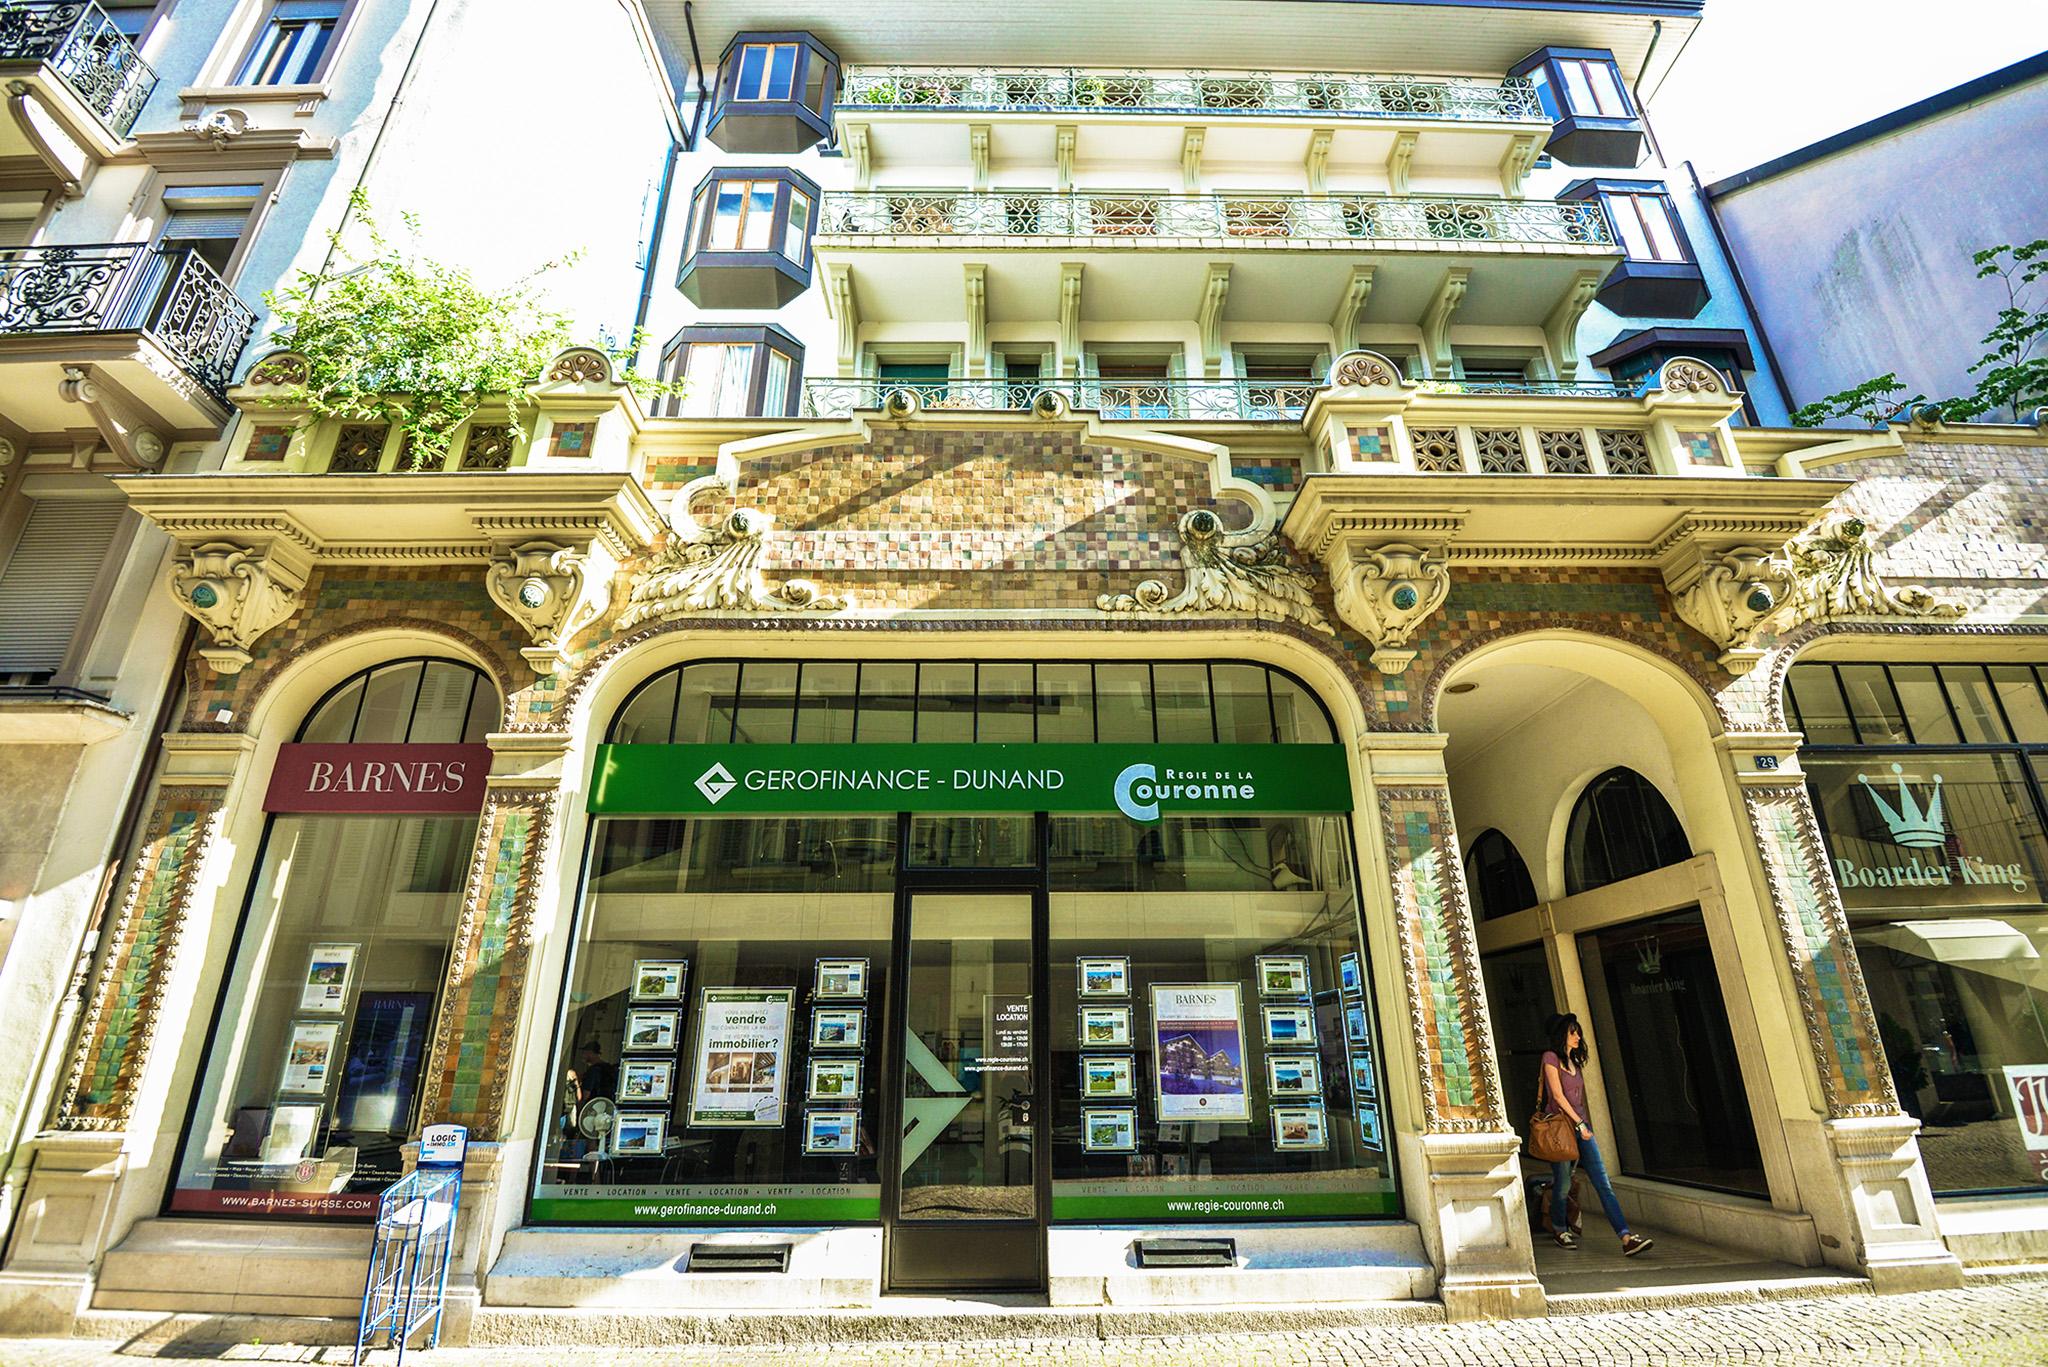 kt_2020_300_Keytours_excursions_Swisstours_vevey-city4_2048_10